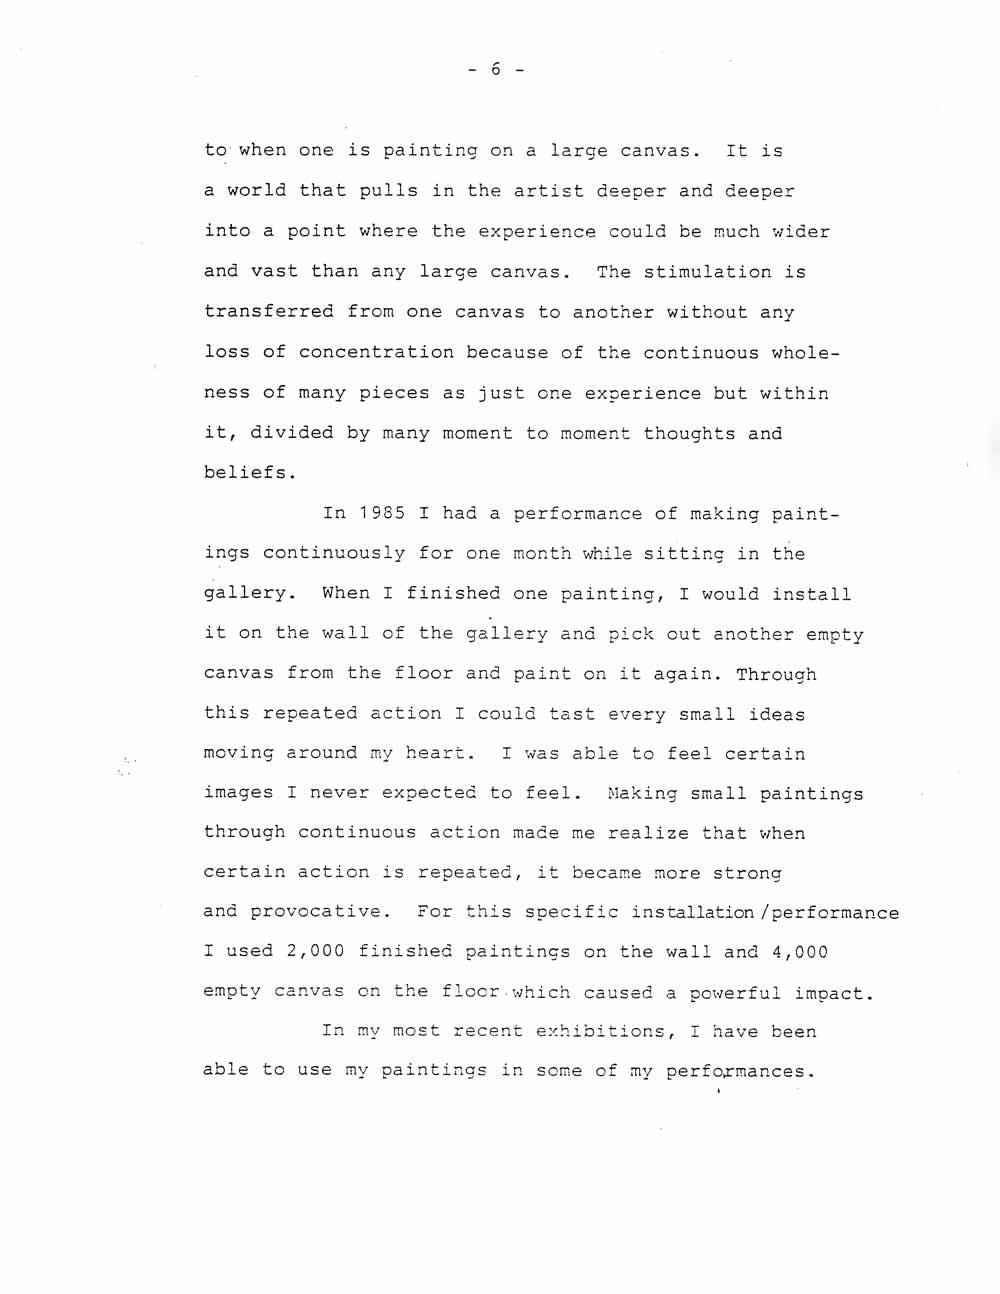 Ik-Joong Kang's Artist Statement, pg 6